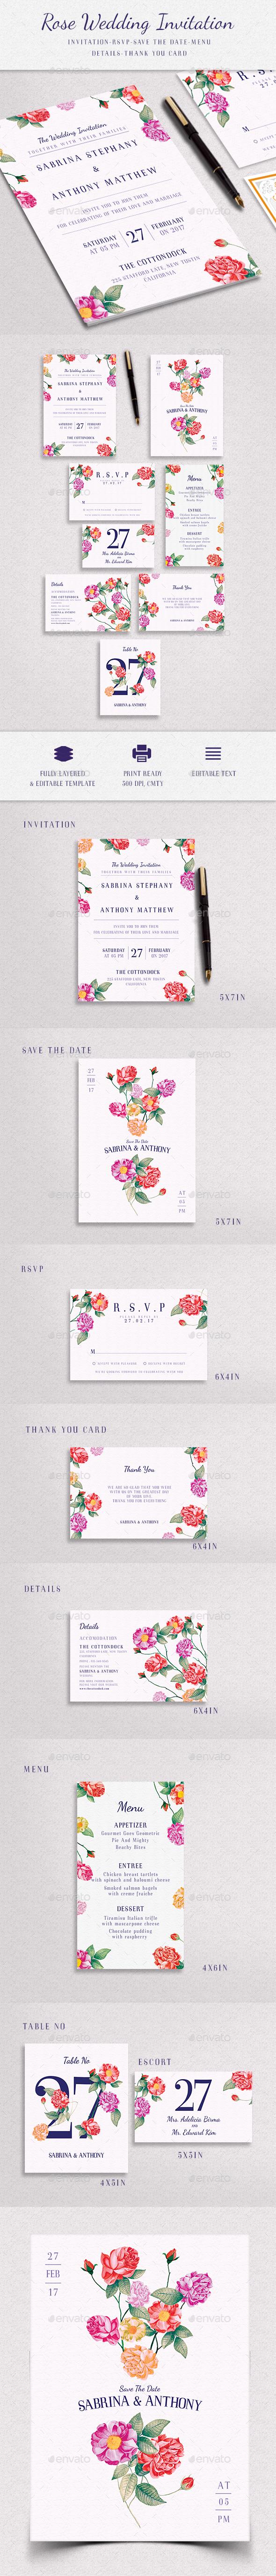 Floral Elegant Wedding Invitation Package - Invitations Cards & Invites